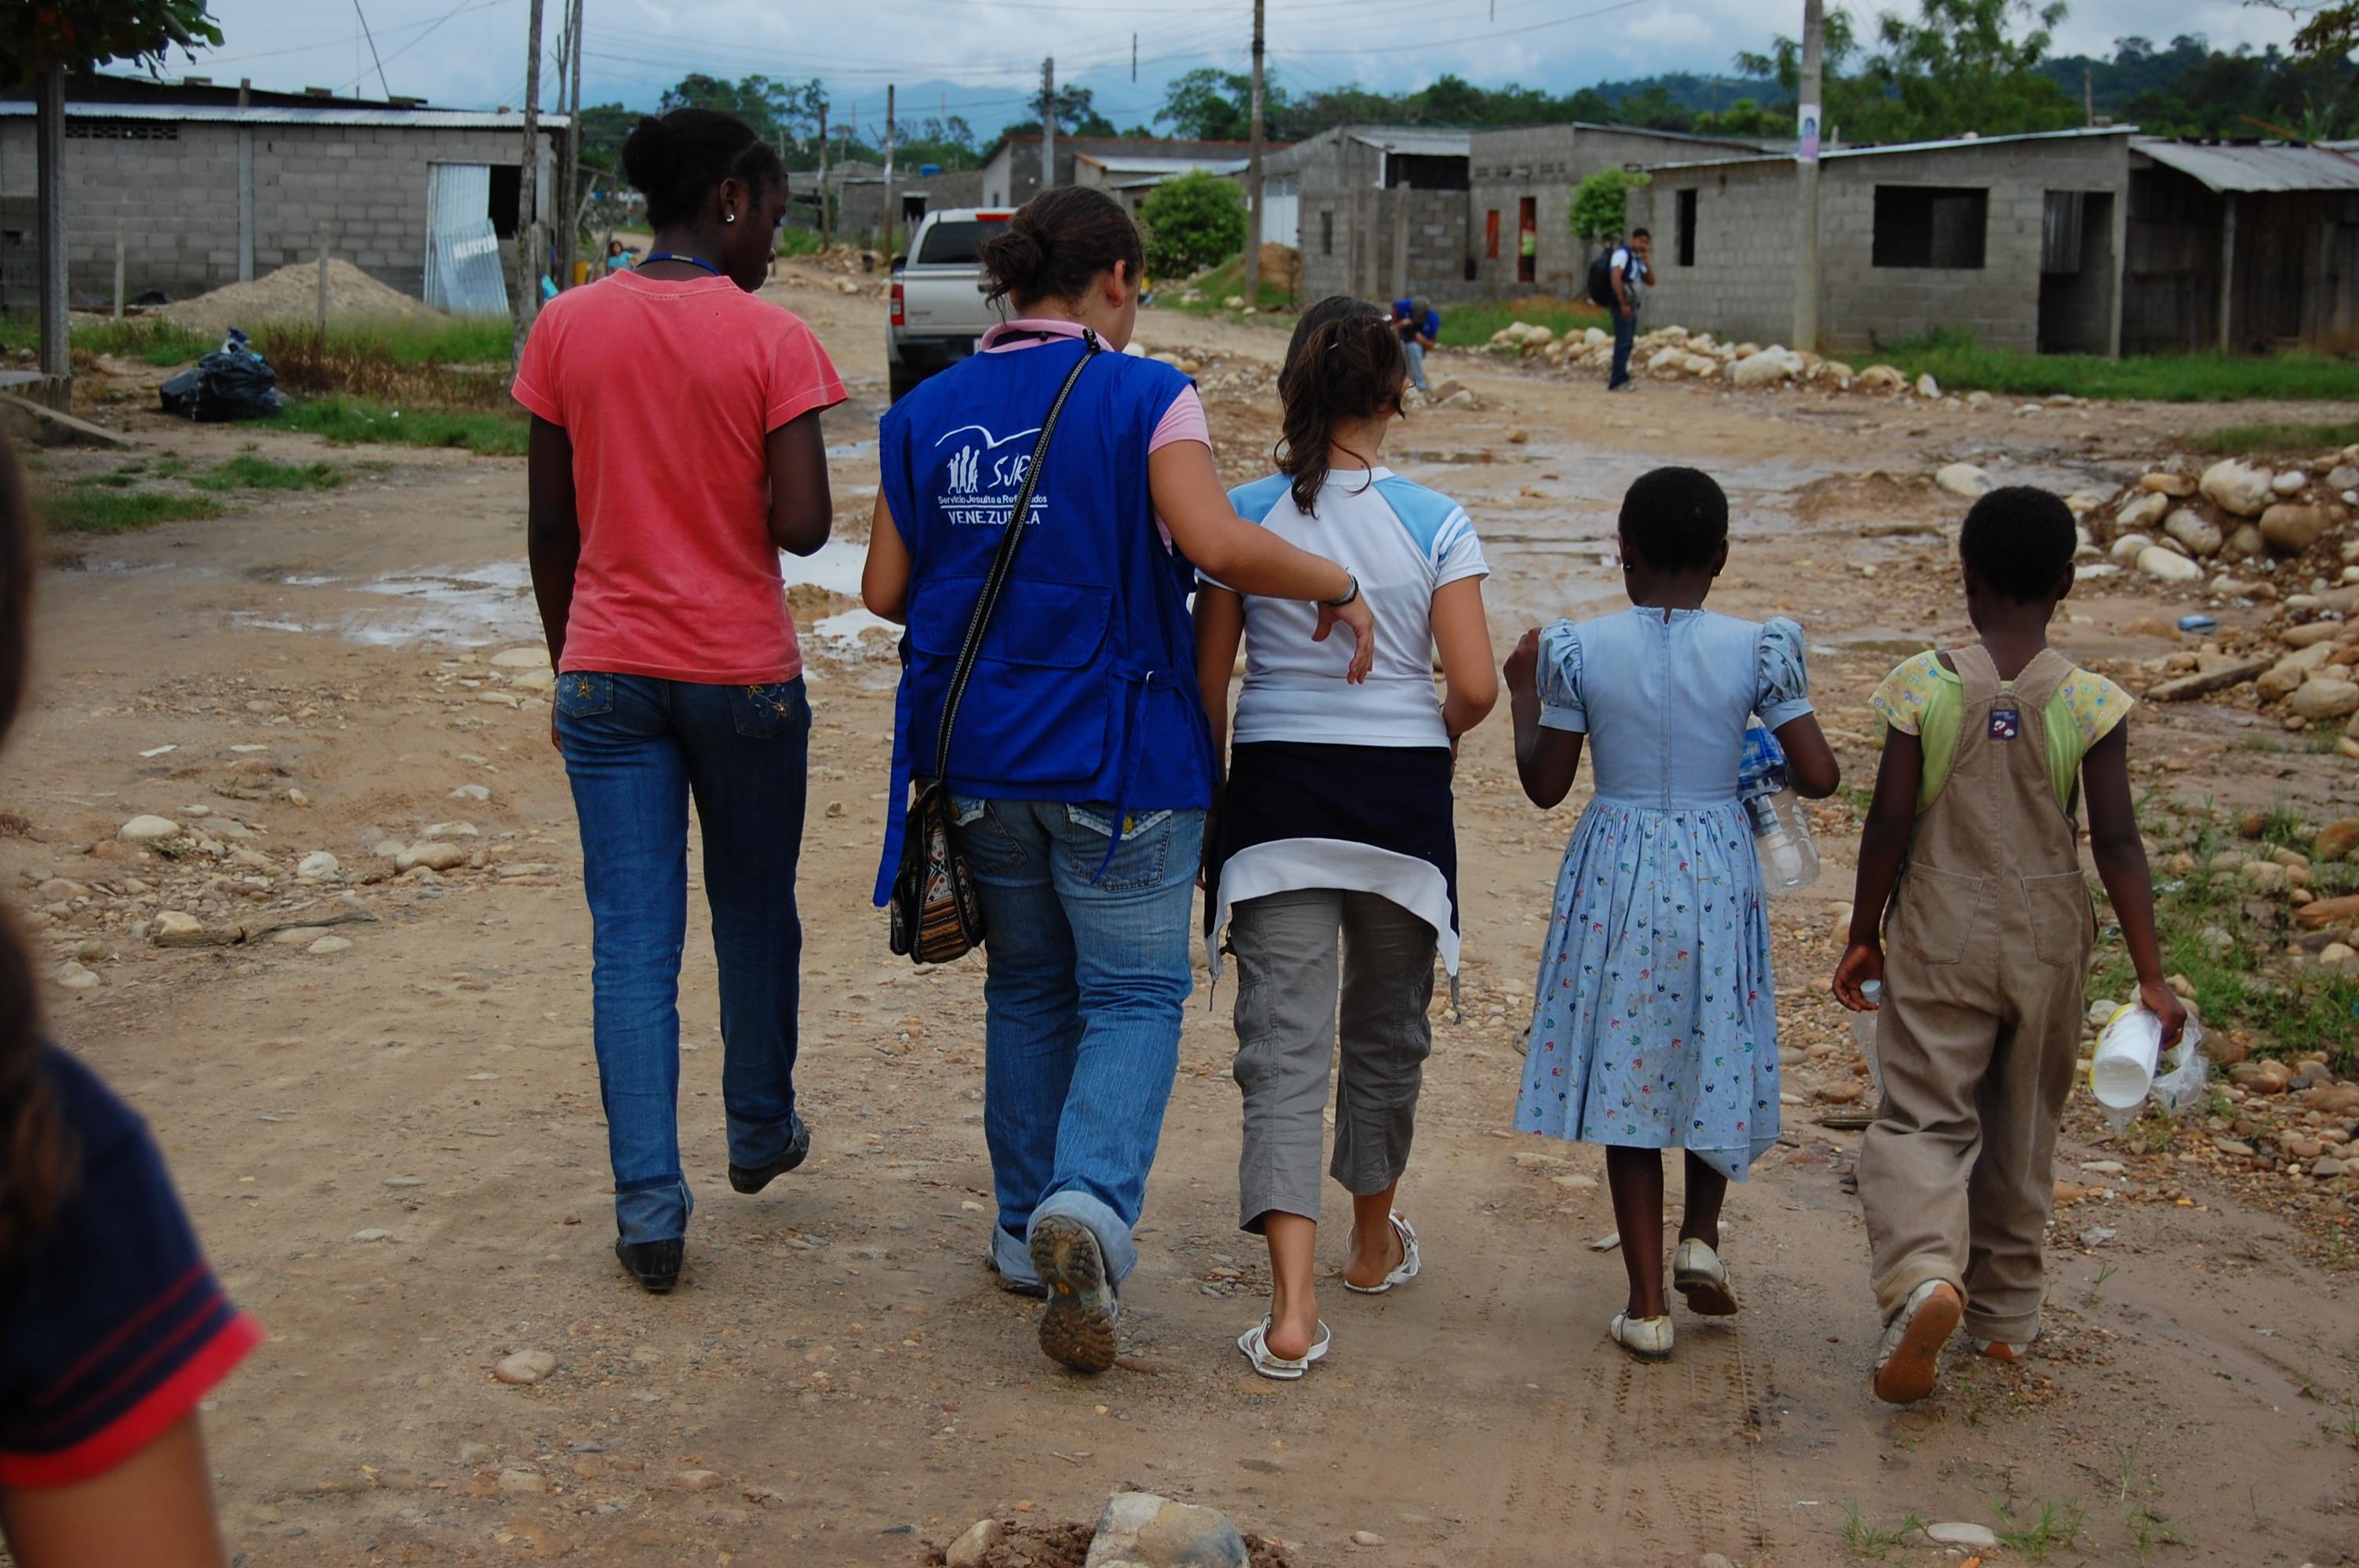 Servicio Jesuita a Refugiados - Venezuela